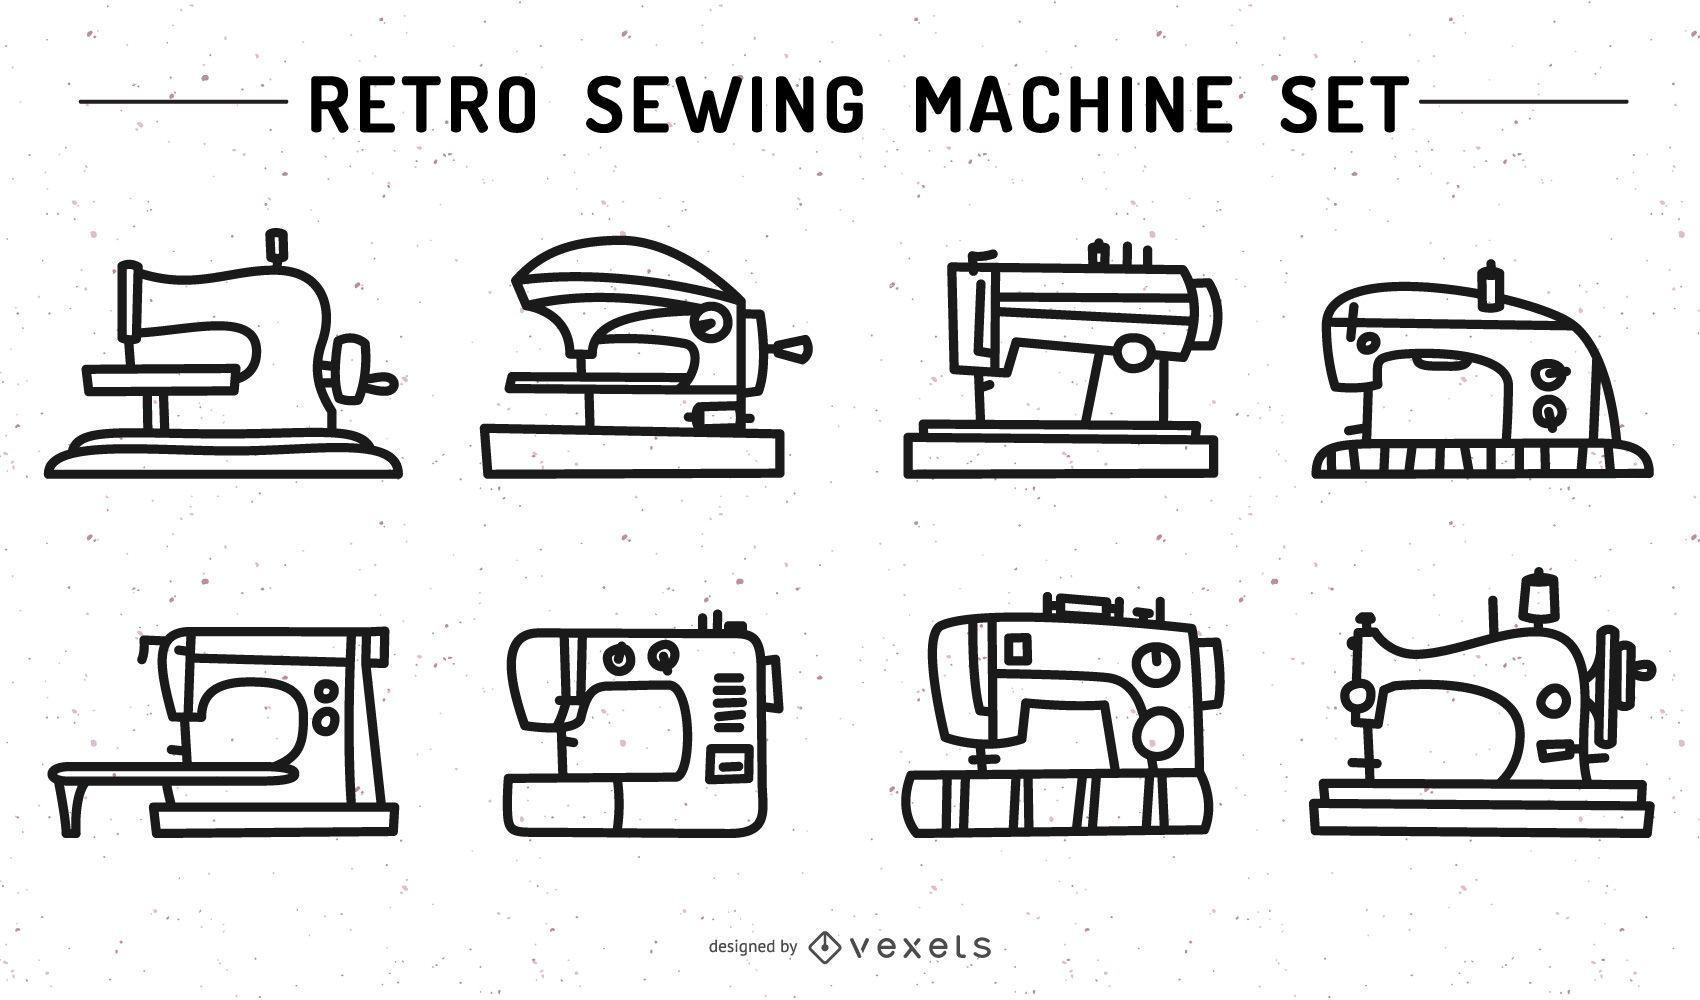 Conjunto de curso de máquina de costura retrô